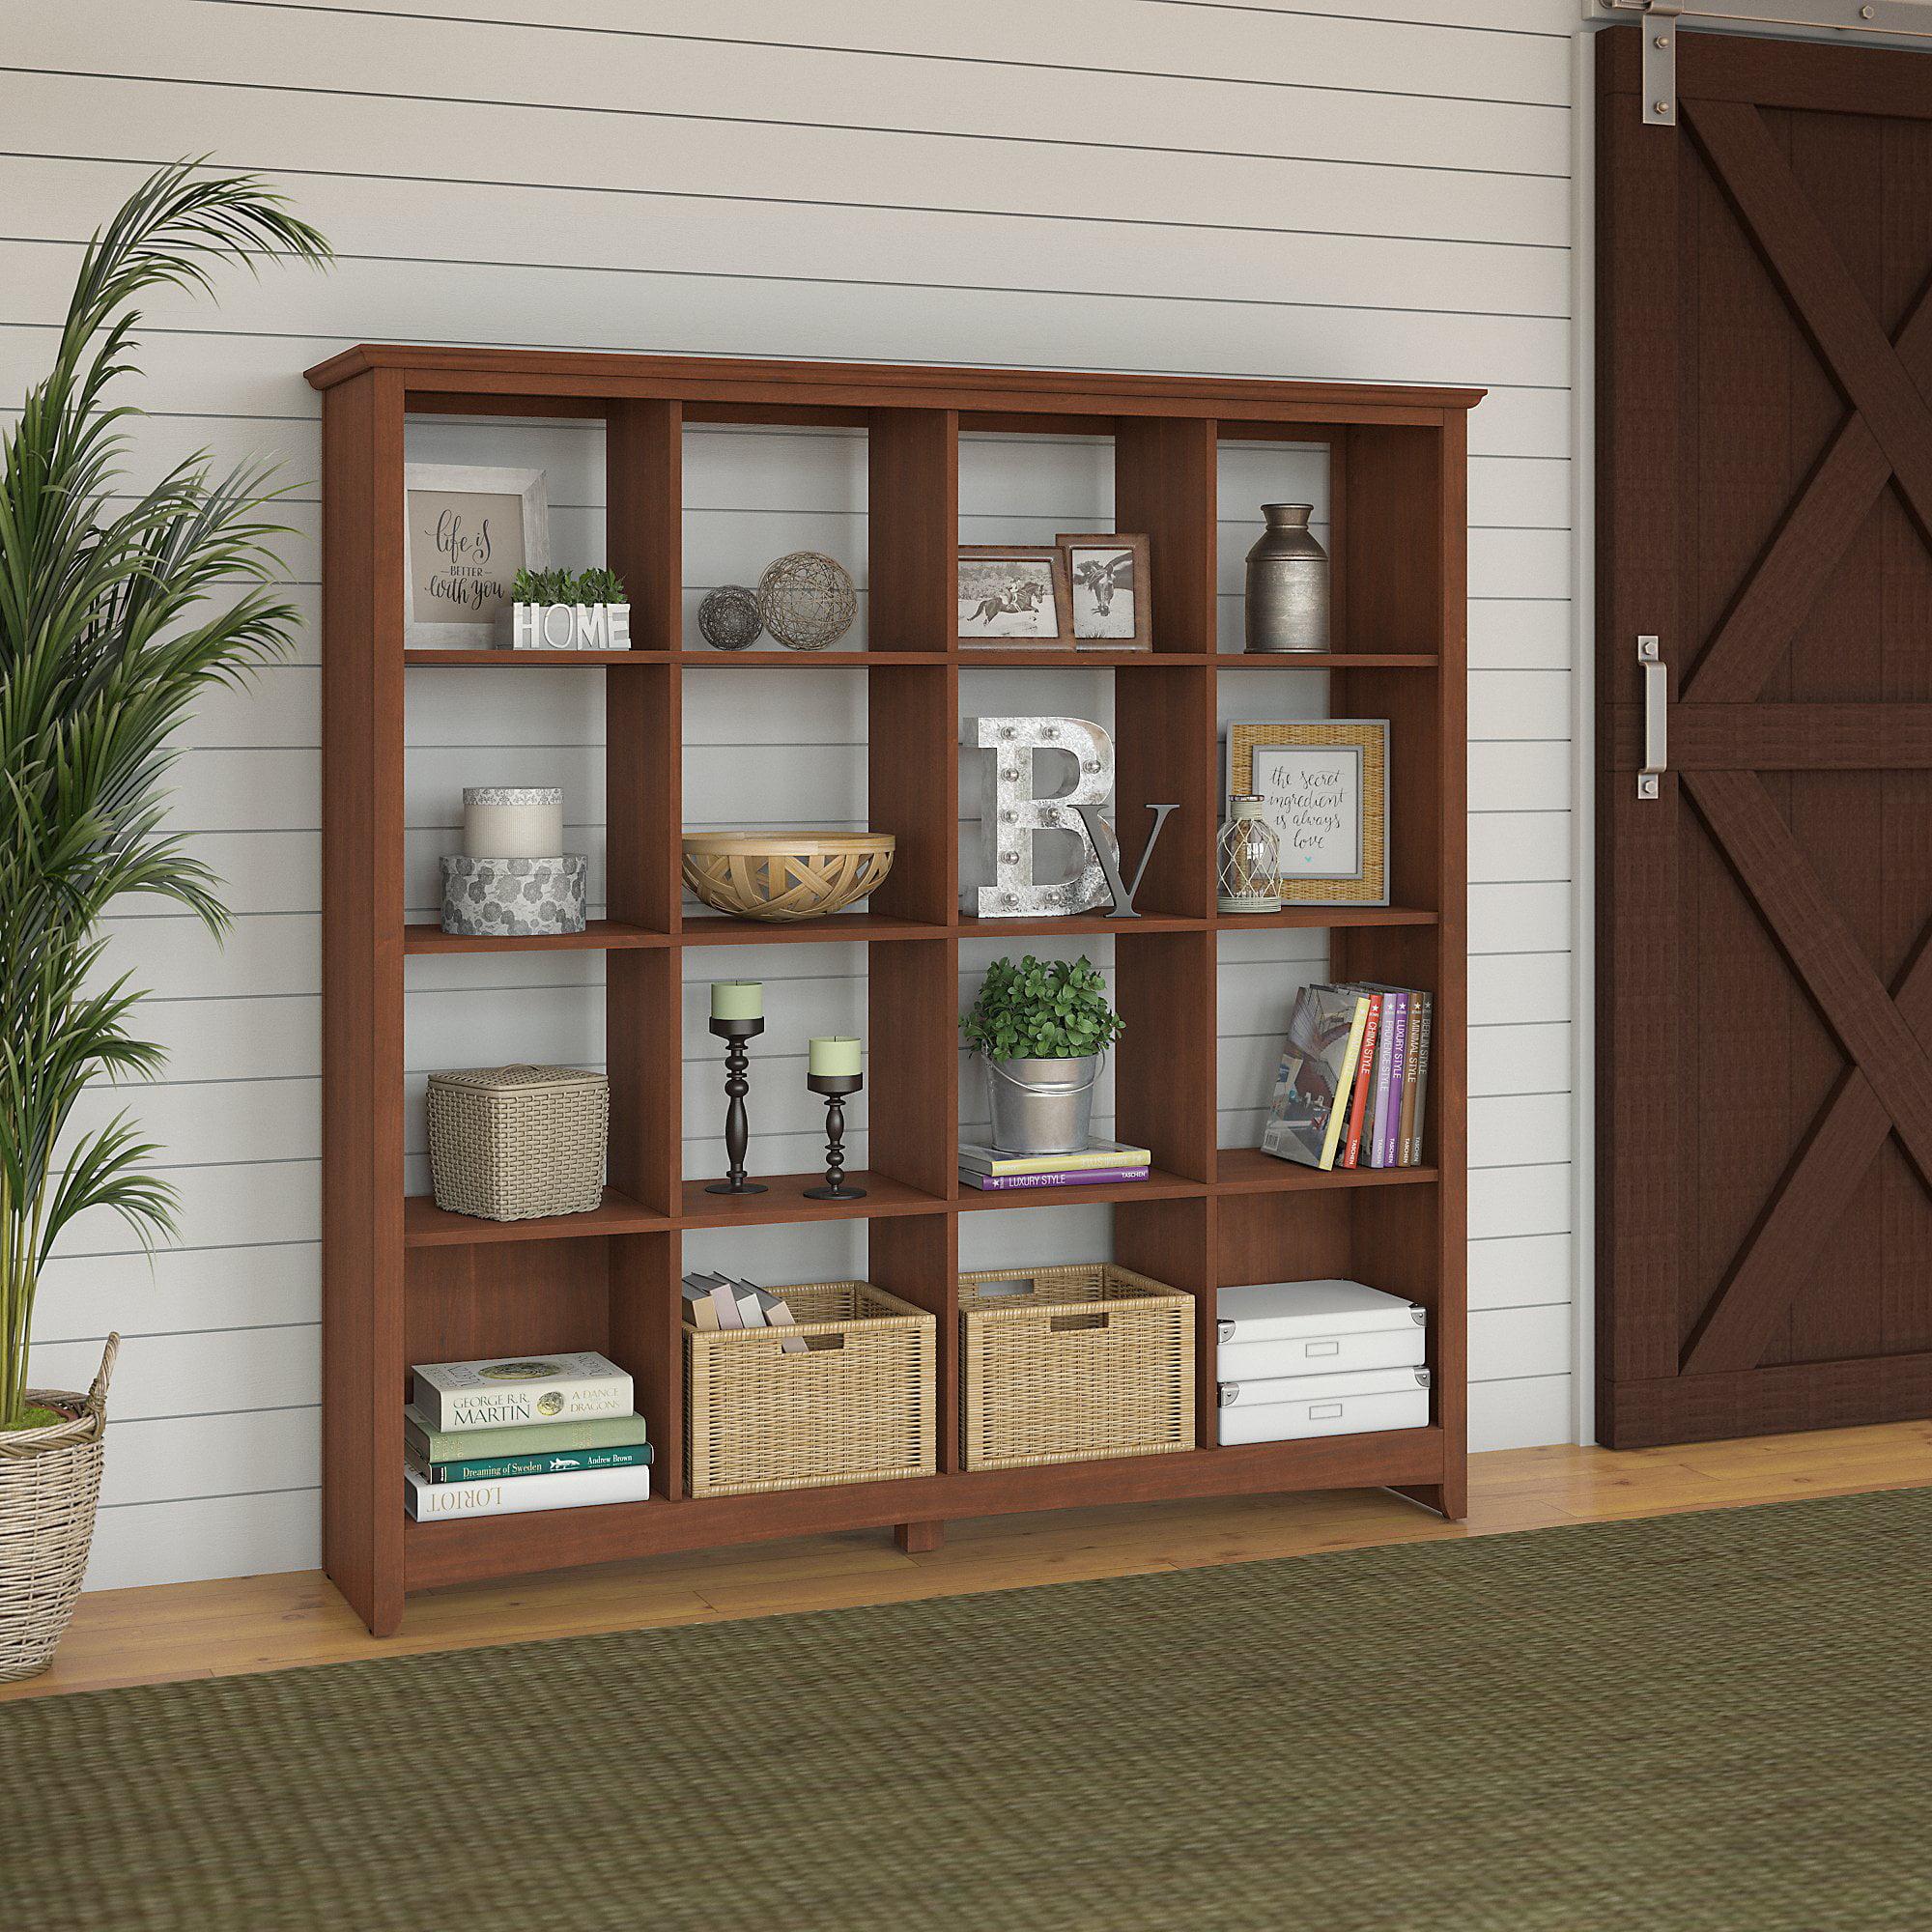 Bush Furniture Buena Vista 16 Cube Bookcase in Serene Cherry